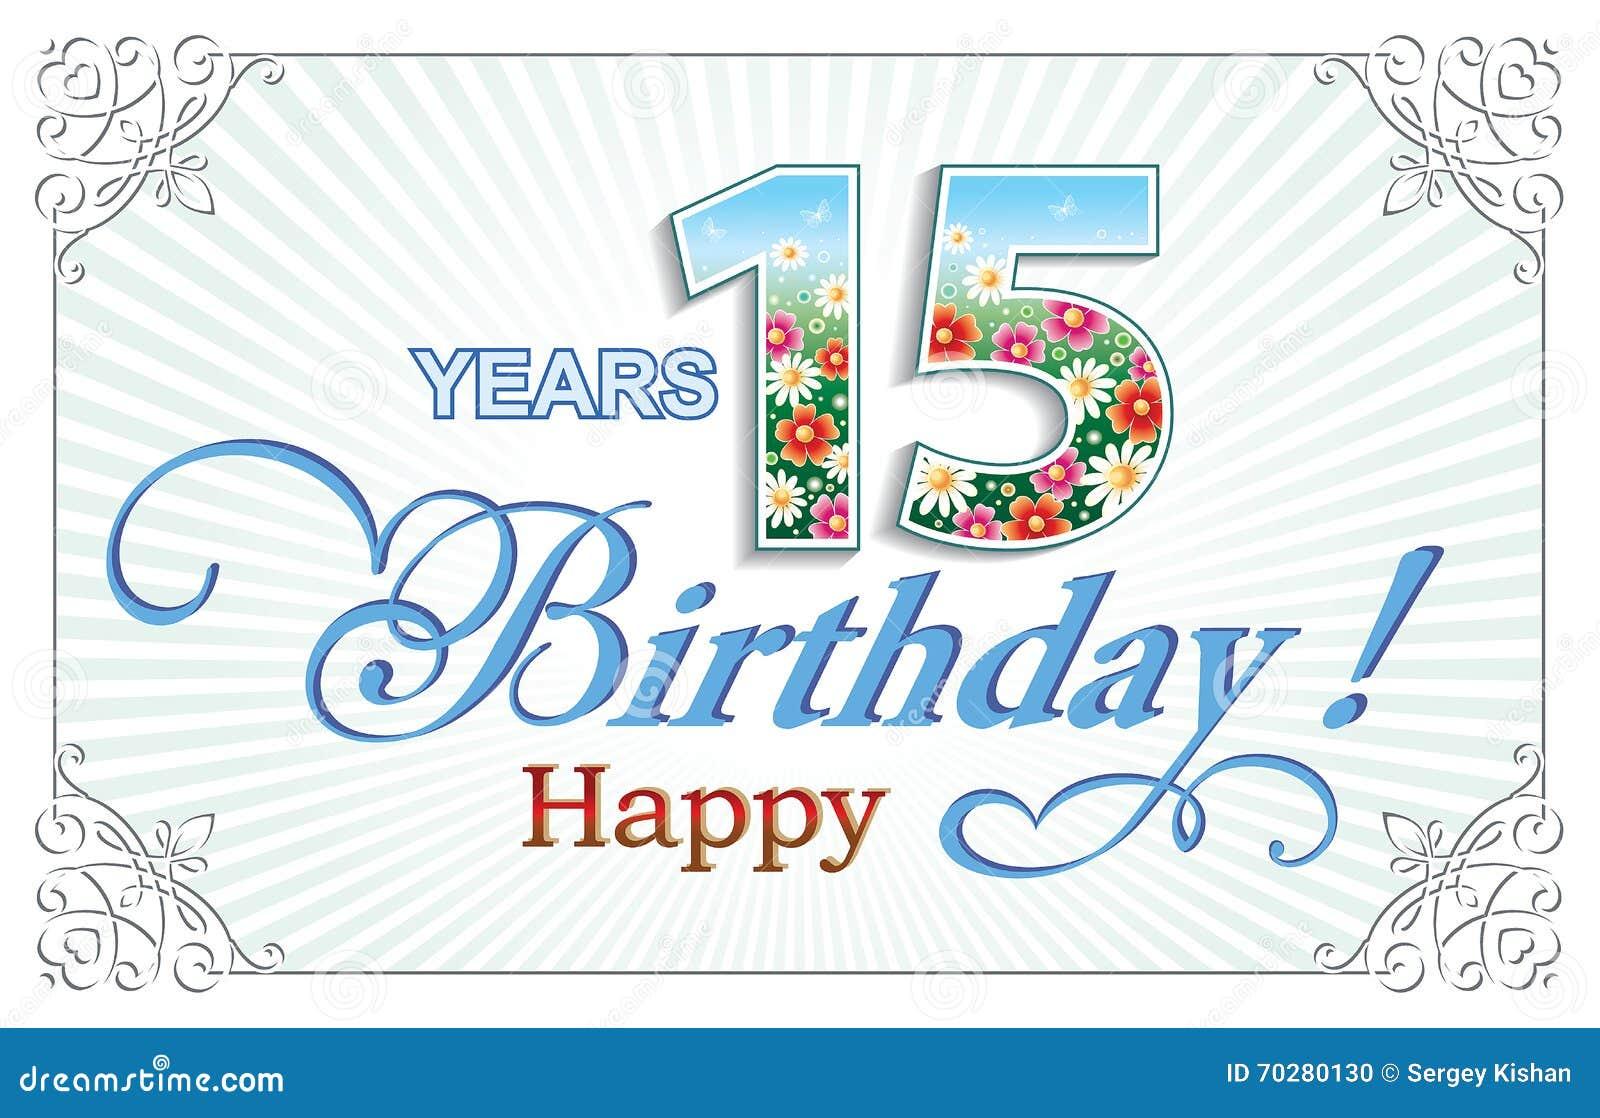 Feliz cumplea os 15 a os ilustraci n del vector imagen - Cumpleanos 15 anos ...